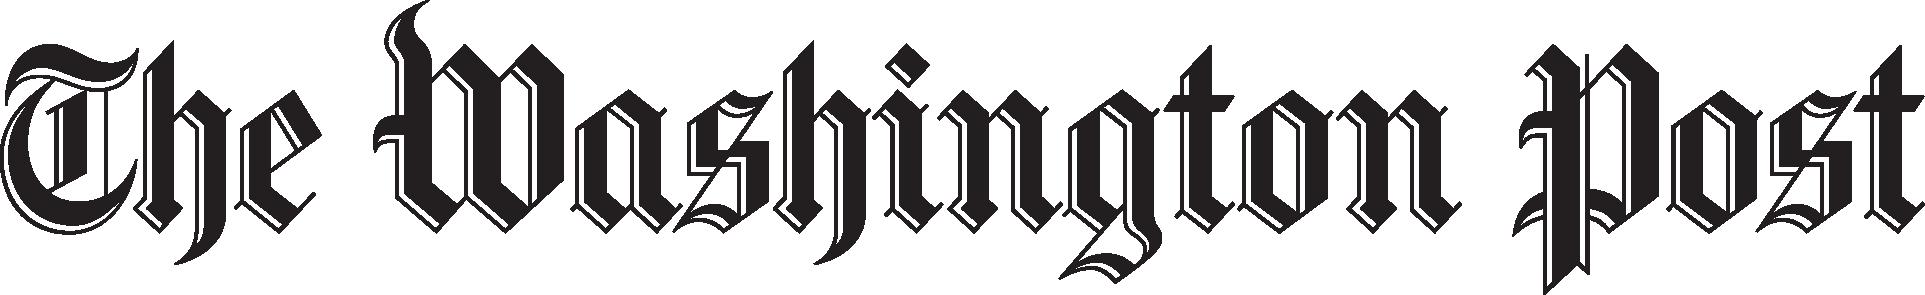 washington_post_logo.png